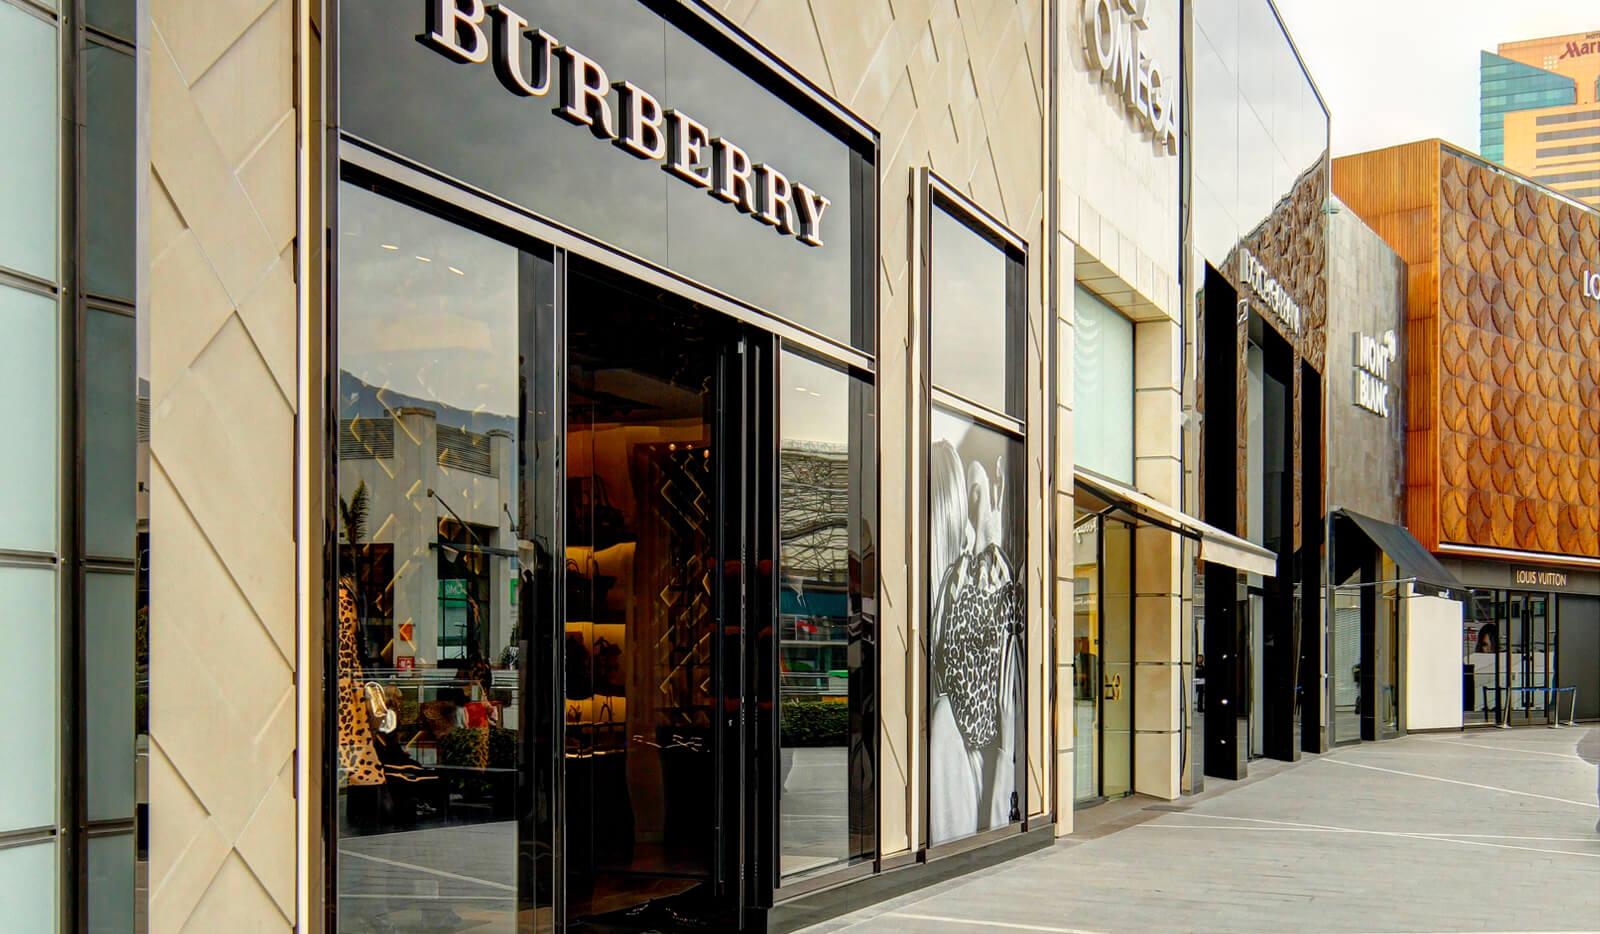 Burberry_001